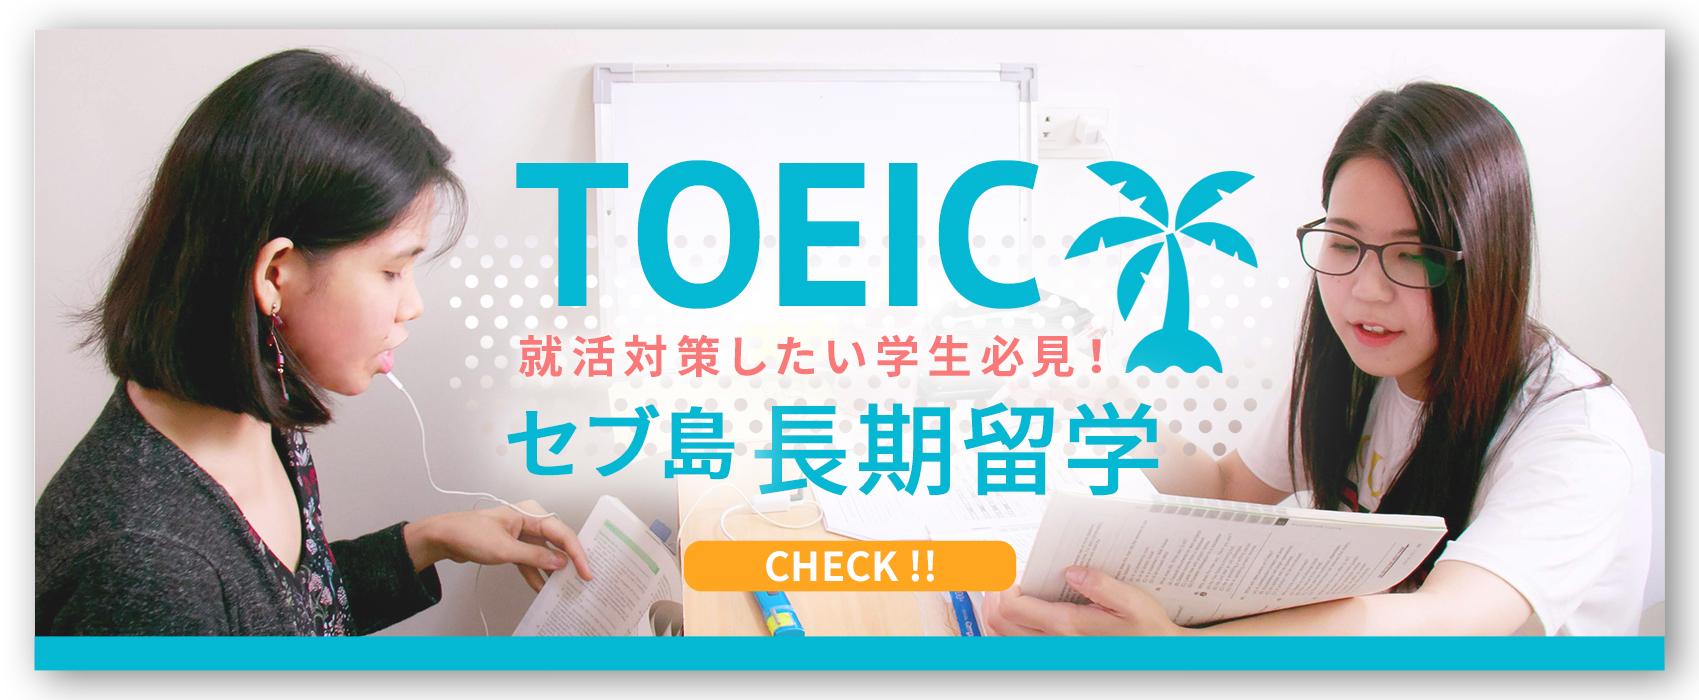 TOEIC長期留学